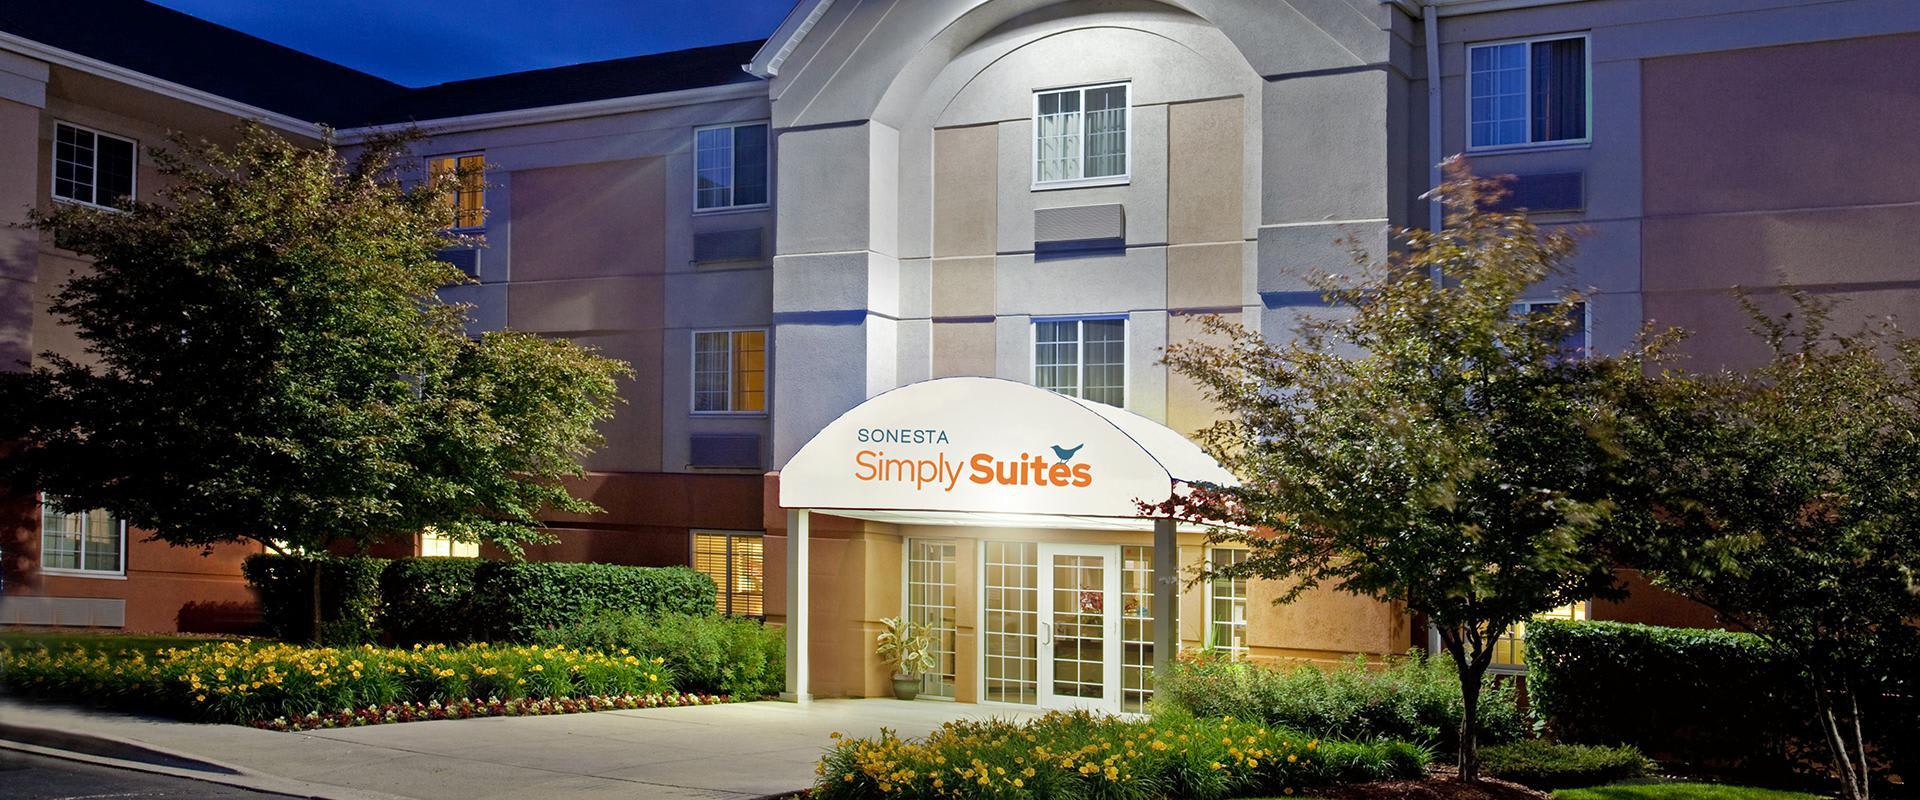 Sonesta Simply Suites Chicago Waukegan Hotel Entrance